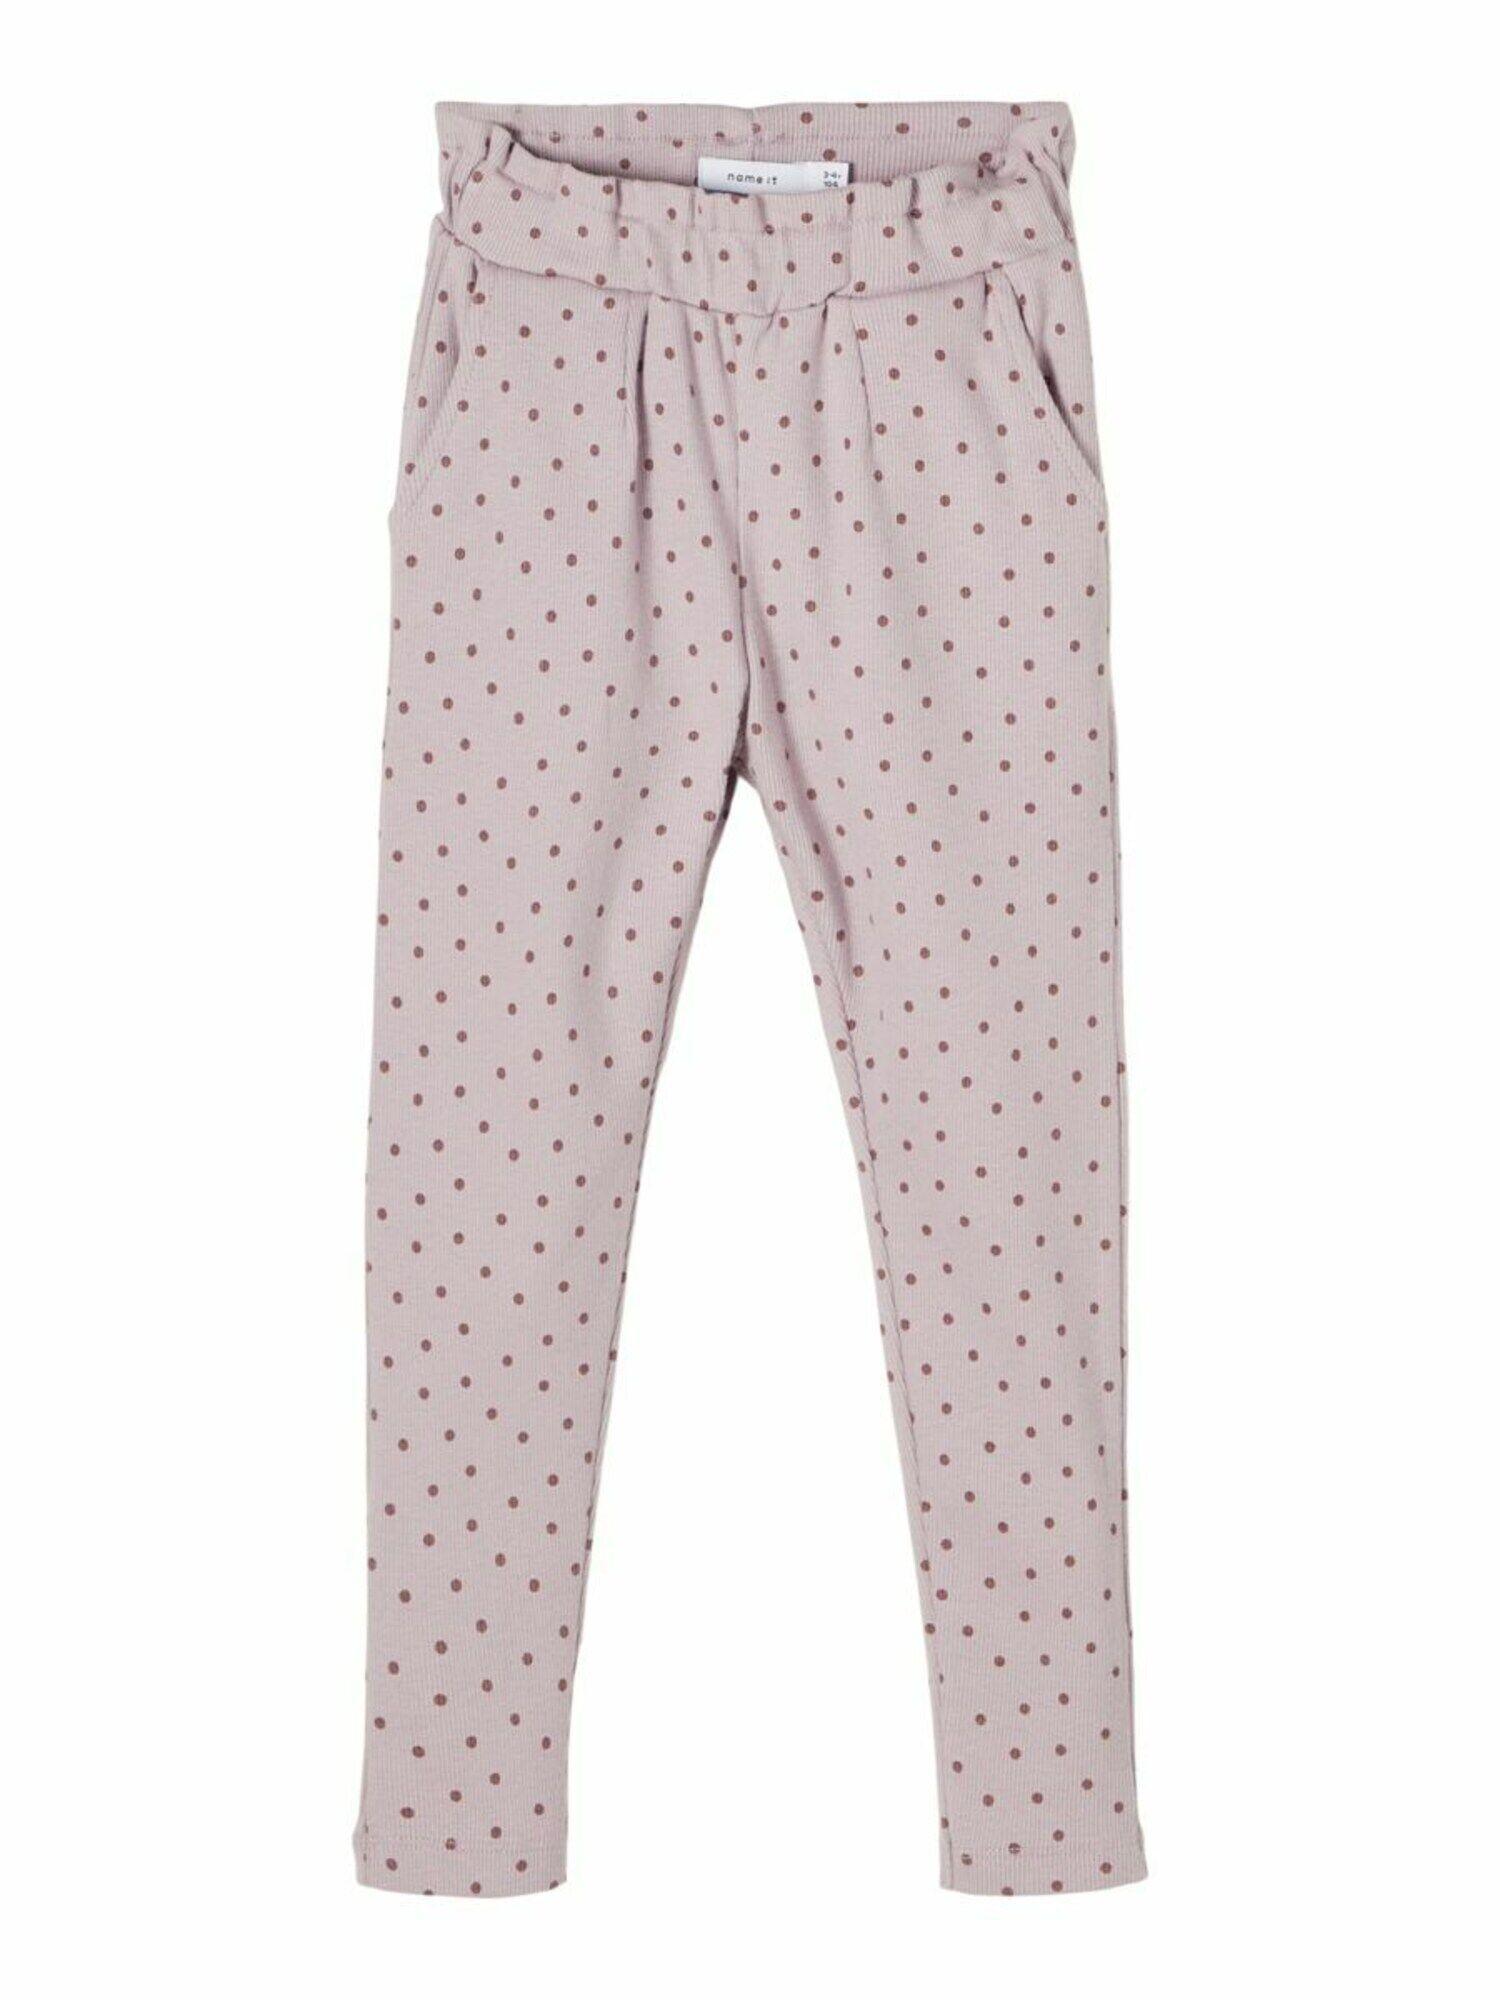 NAME IT Pantalon  - Violet - Taille: 92 - girl